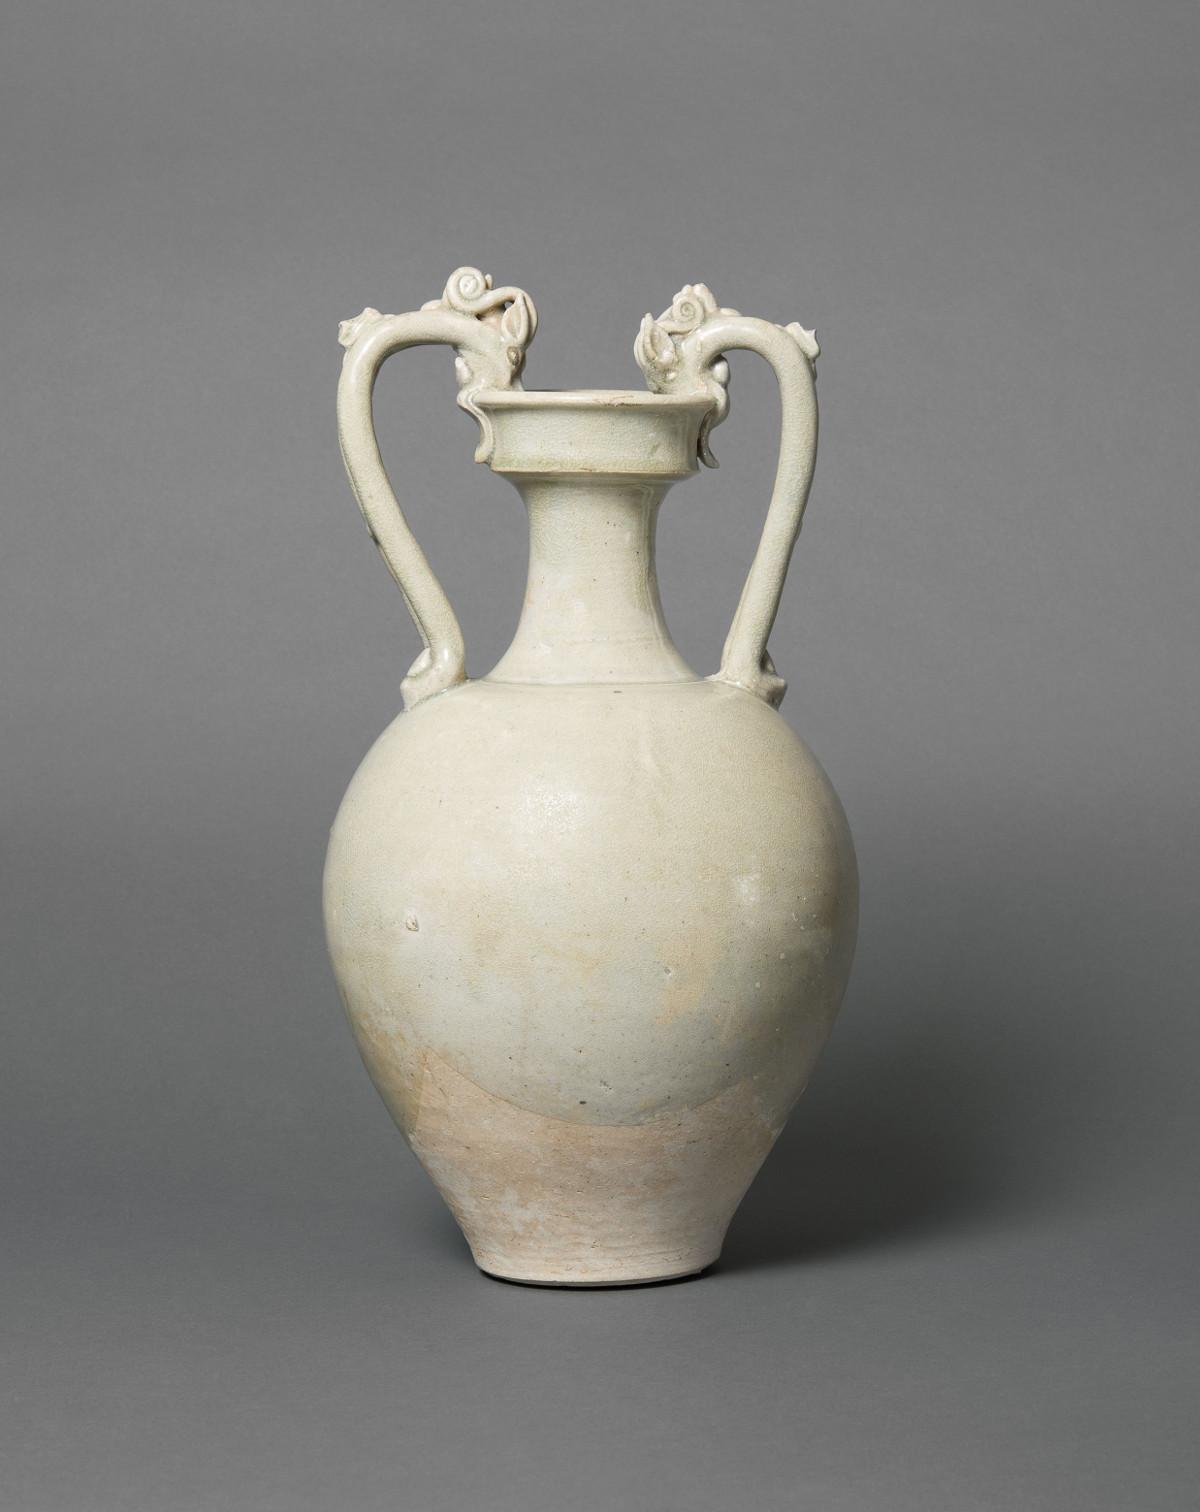 Große Vase mit drachenförmigen Henkeln, Xing-Ware, Steinzeug, China, Tang-Dynastie (618–907). Schenkung Dr. Heribert Meurer, 2017. (Foto: Paul Altmann)